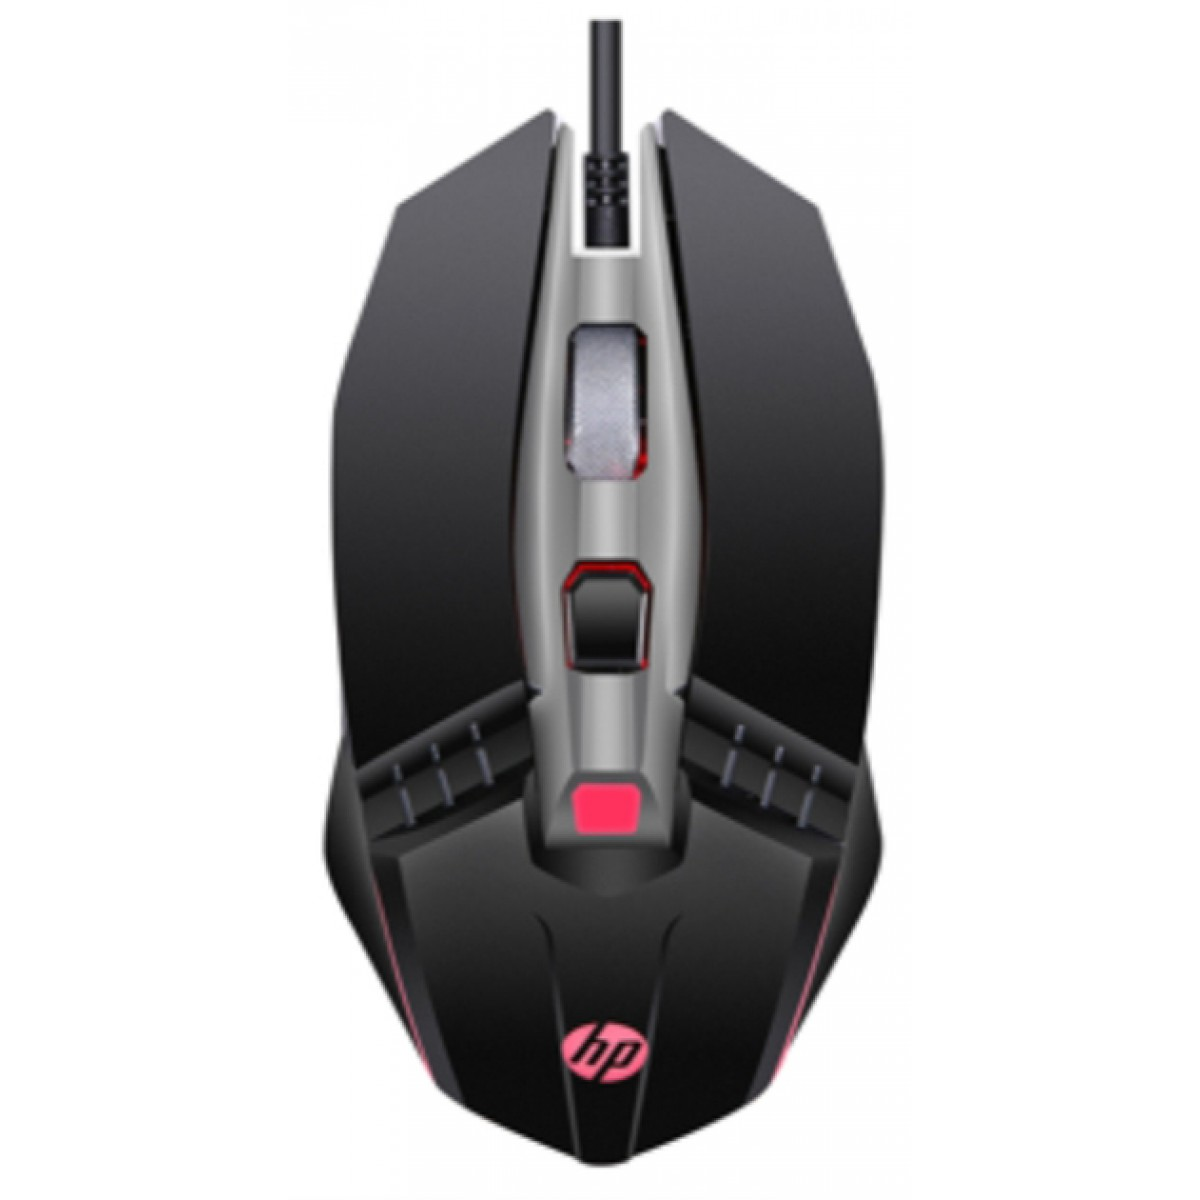 Mouse Gamer HP M270, 2400 DPI, 5 Botões, LED, Black